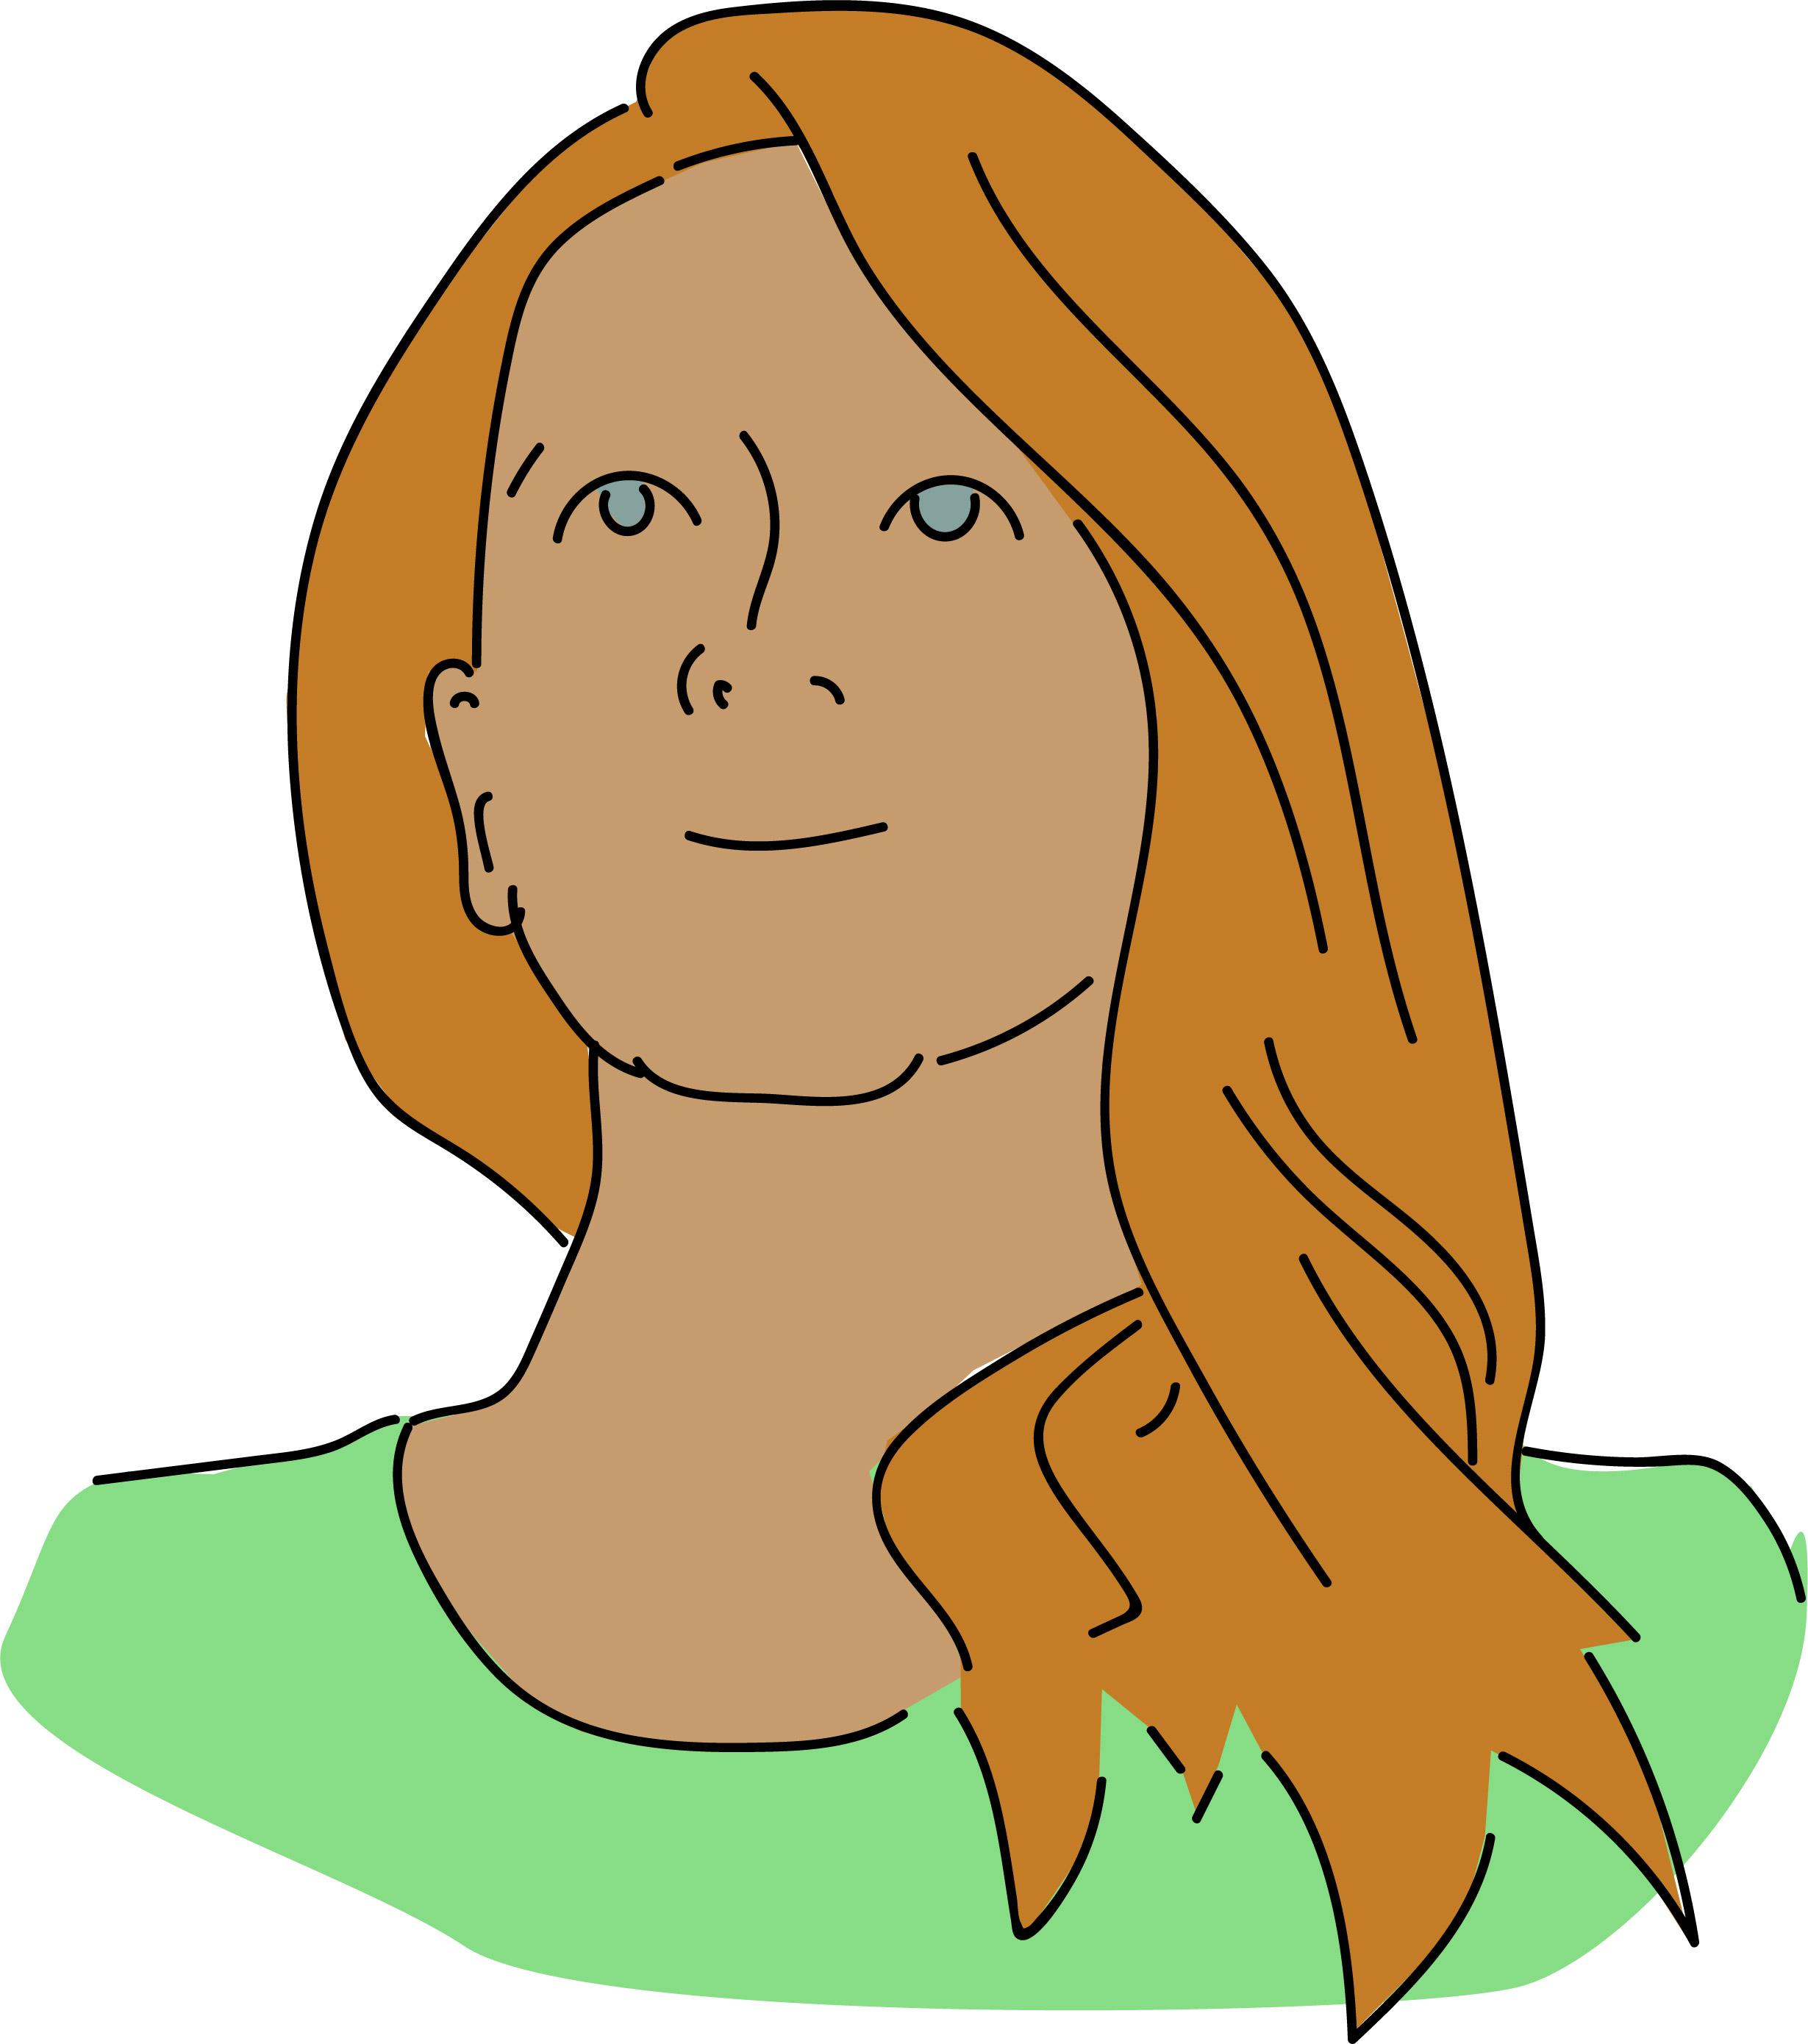 Dianna Muller